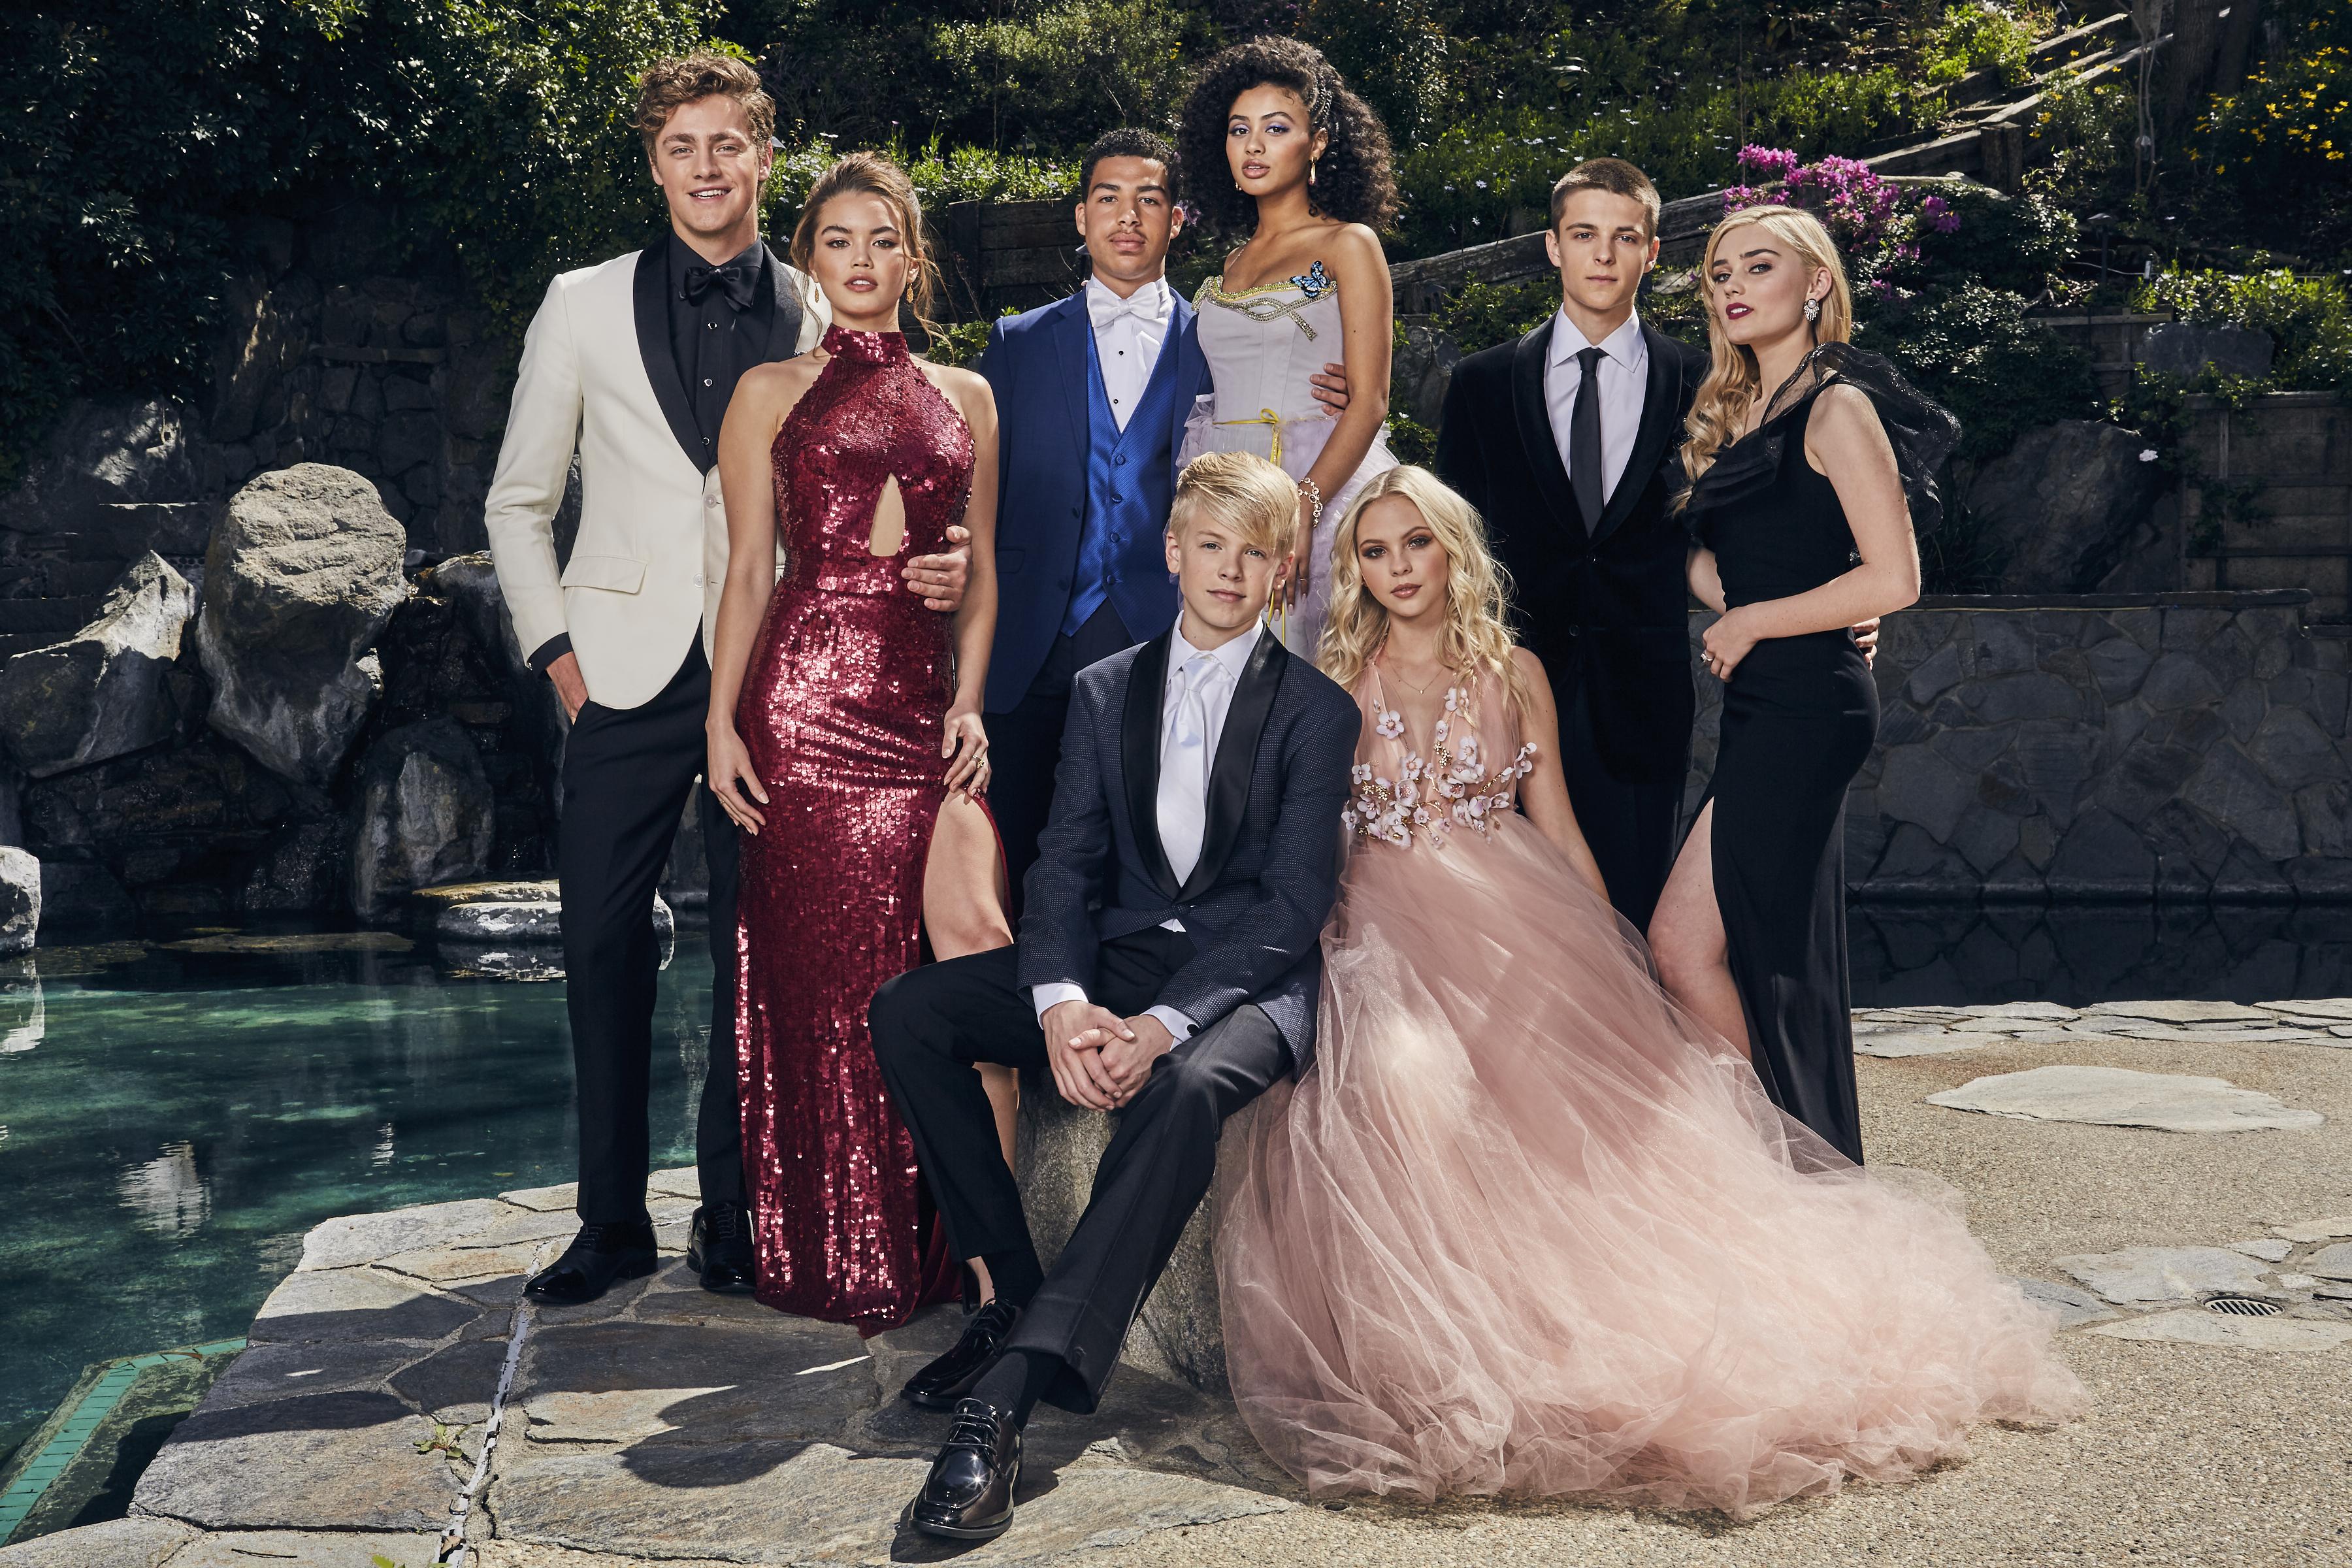 YSBnow 2018 Prom